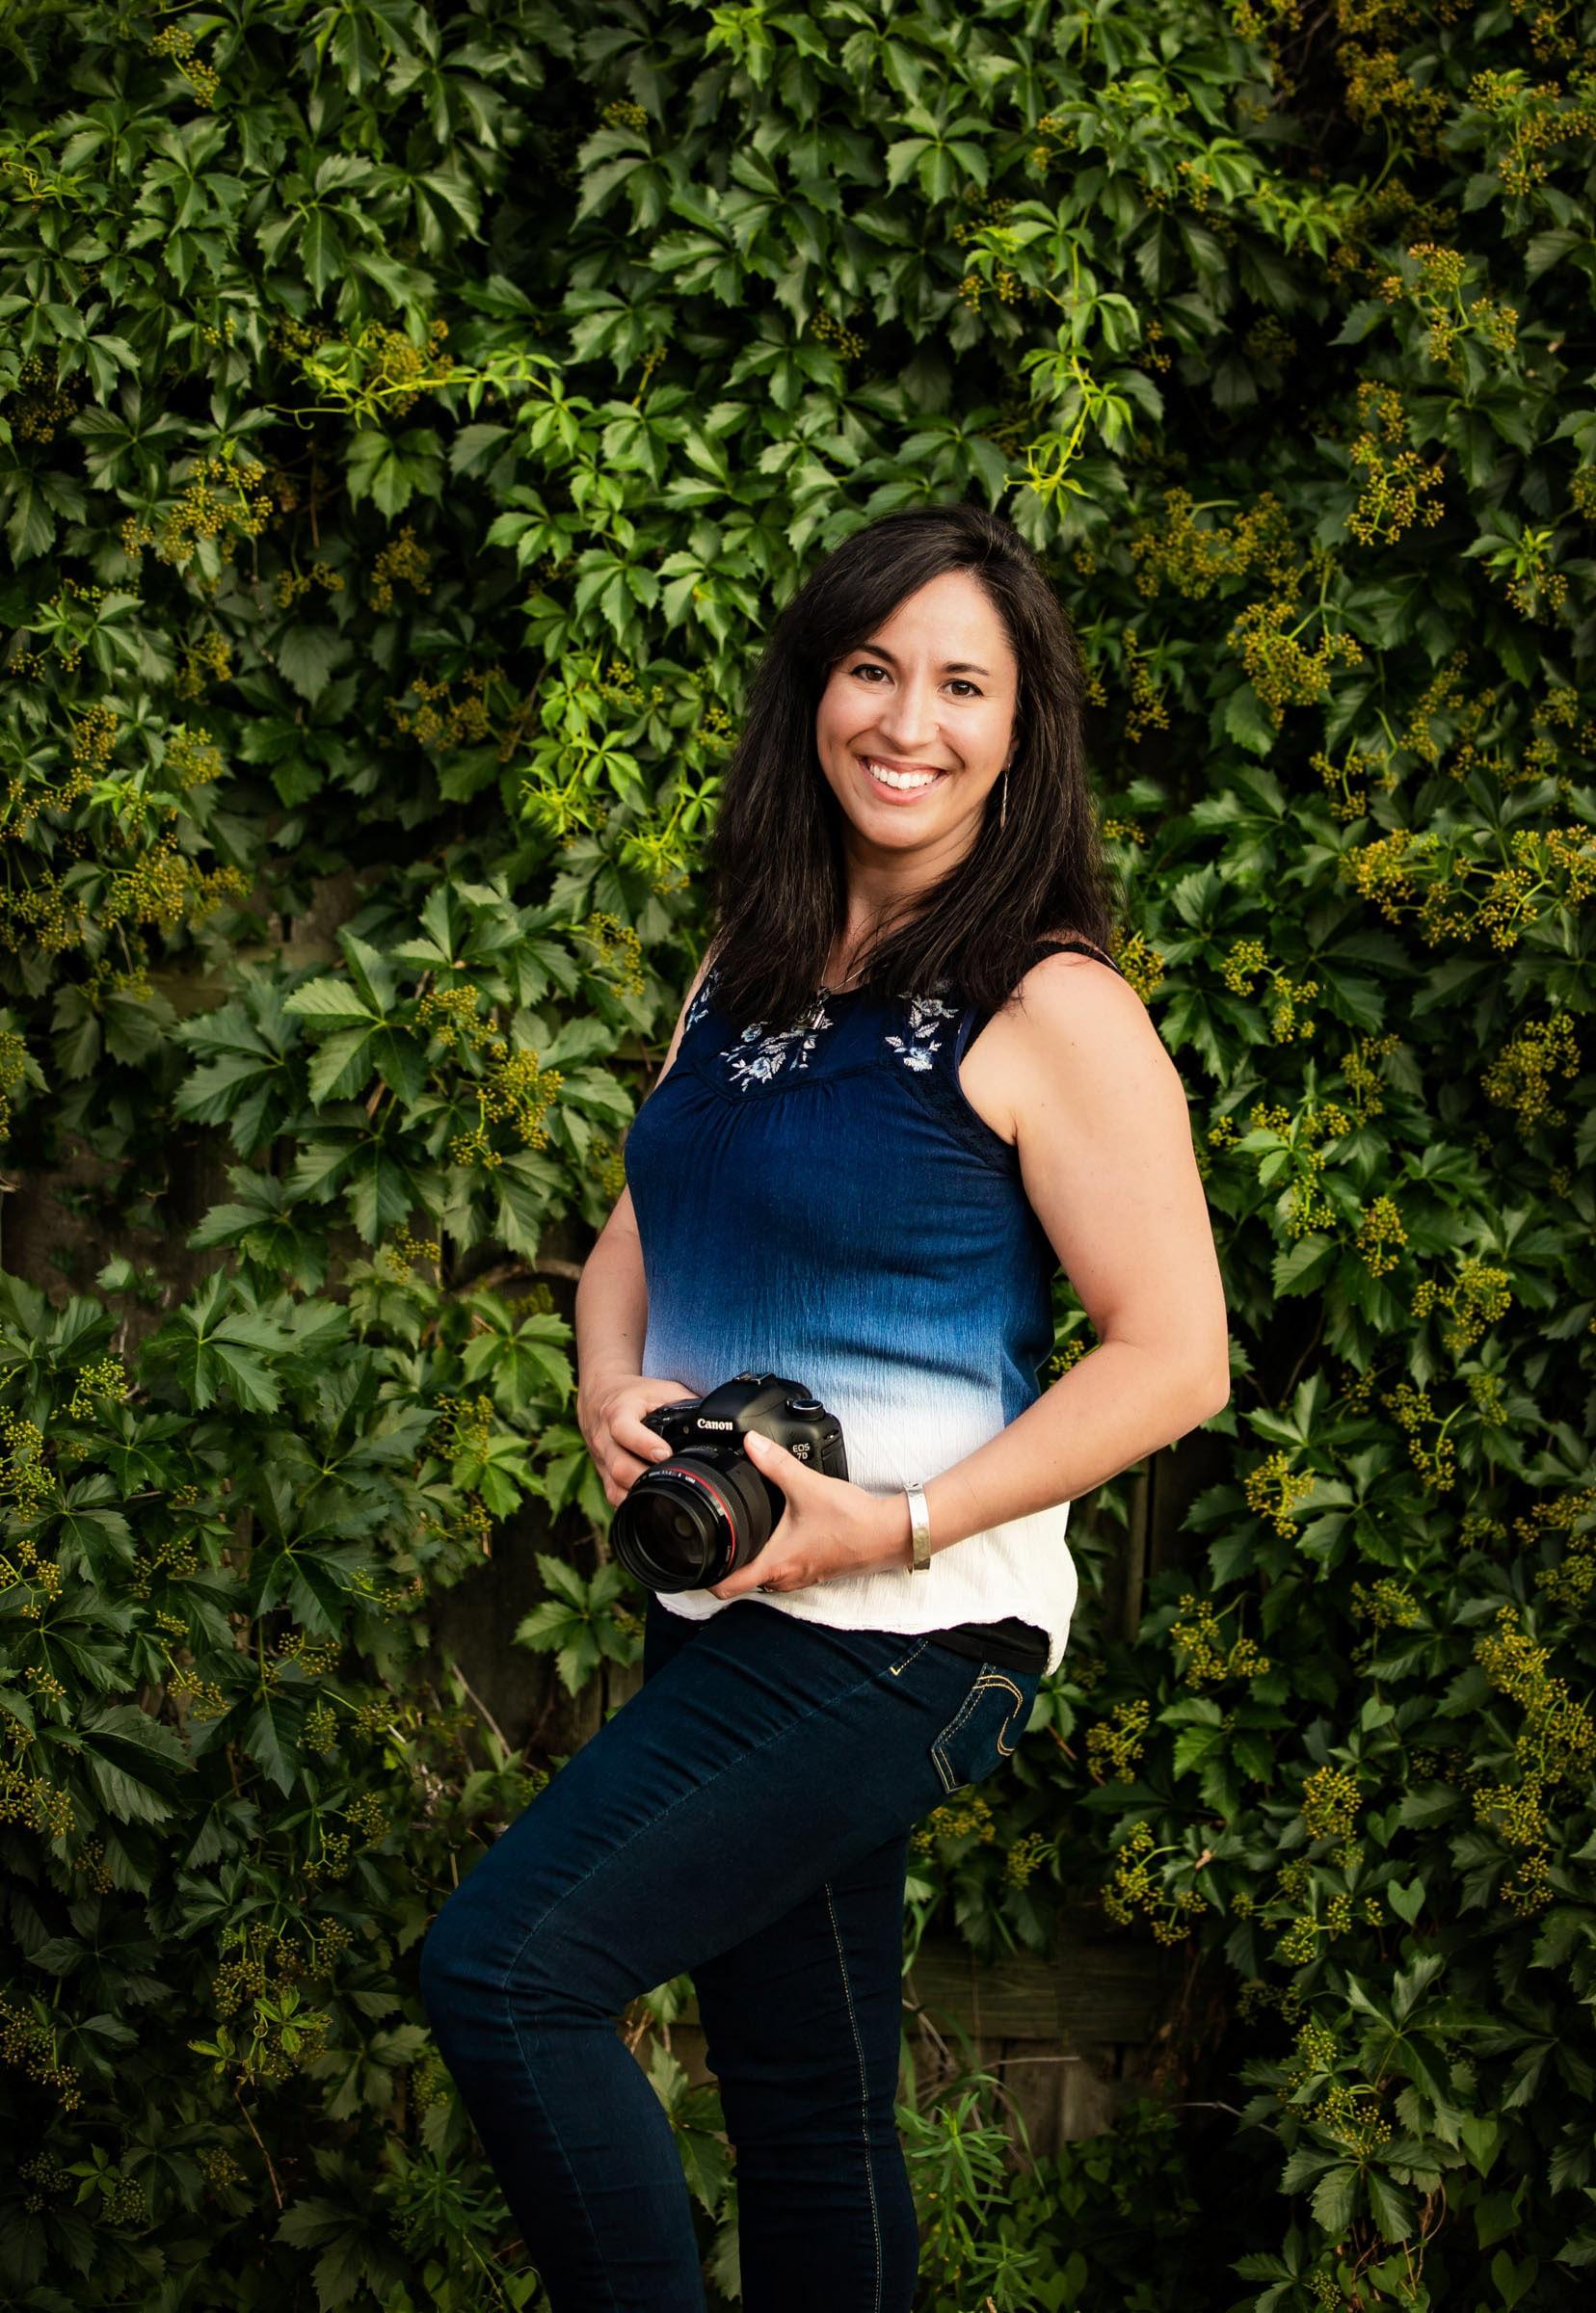 Associate Photographer, Rebecca Berra